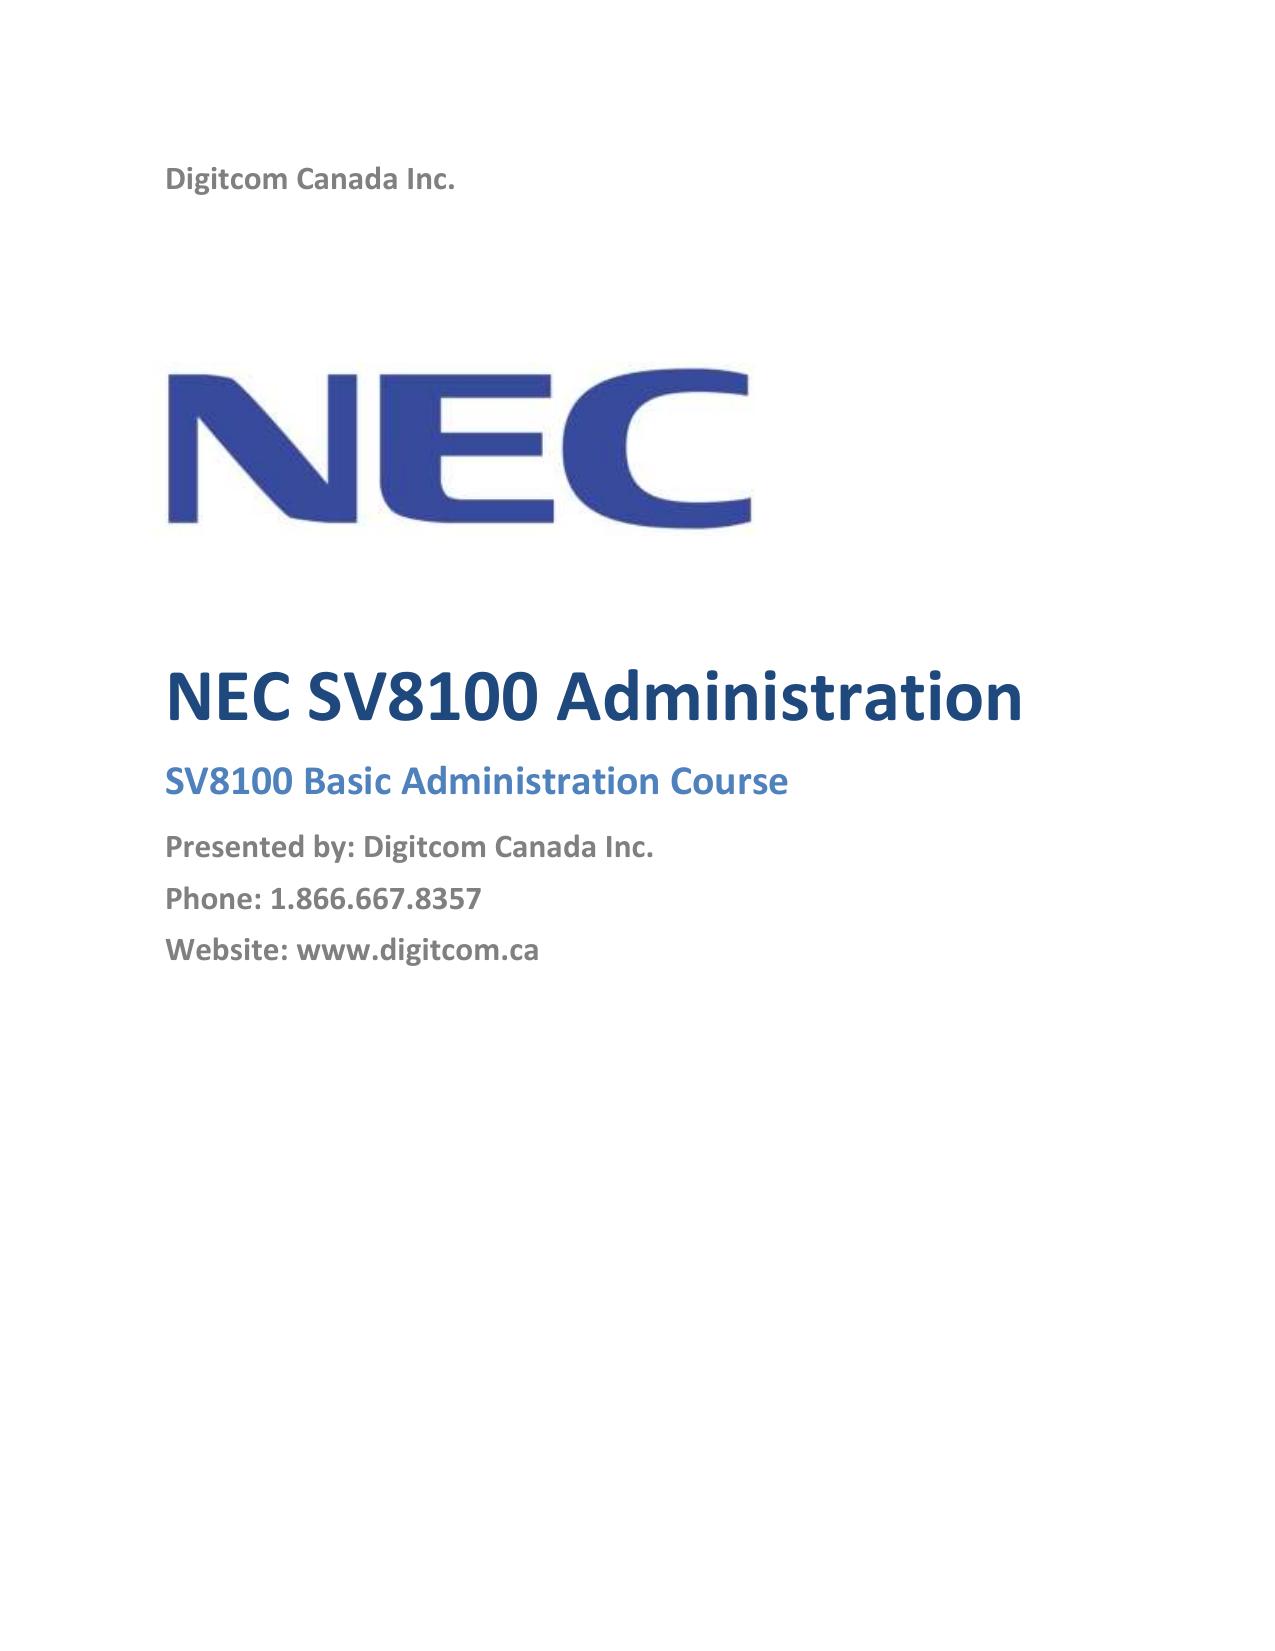 NEC SV8100 Administration